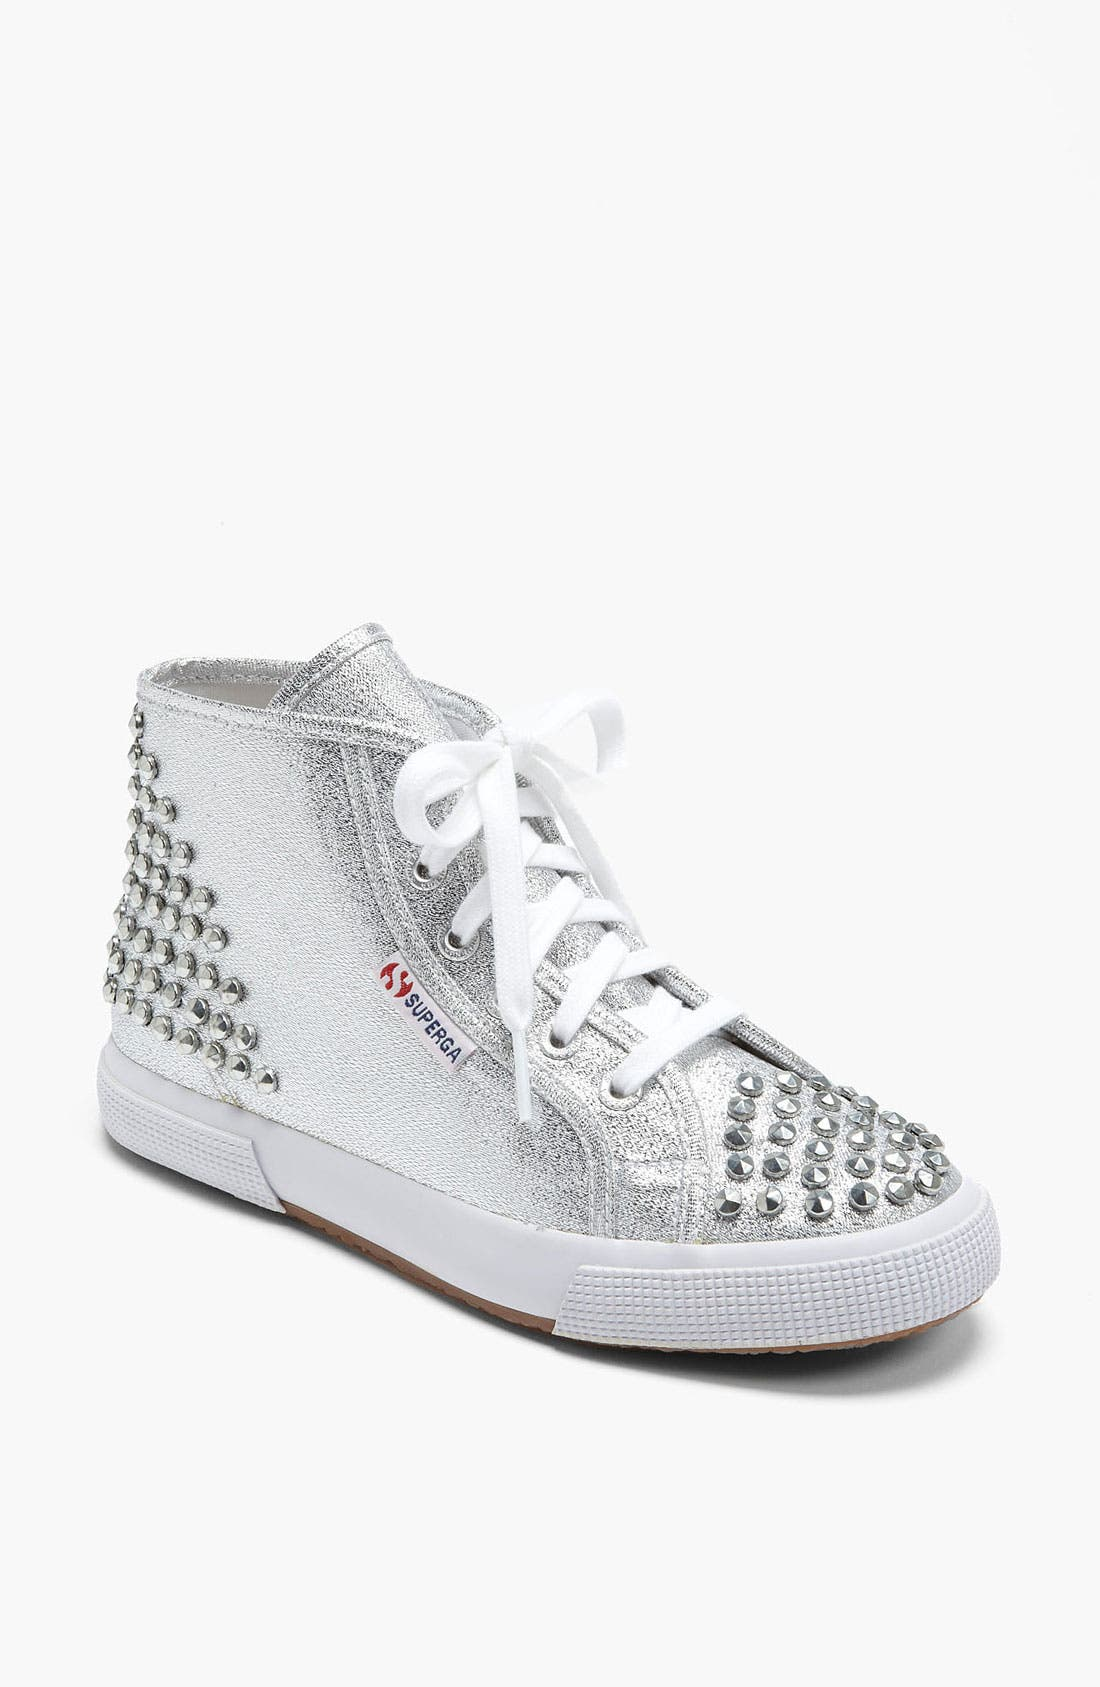 Main Image - Superga 'Lamé Studs' Sneaker (Women)